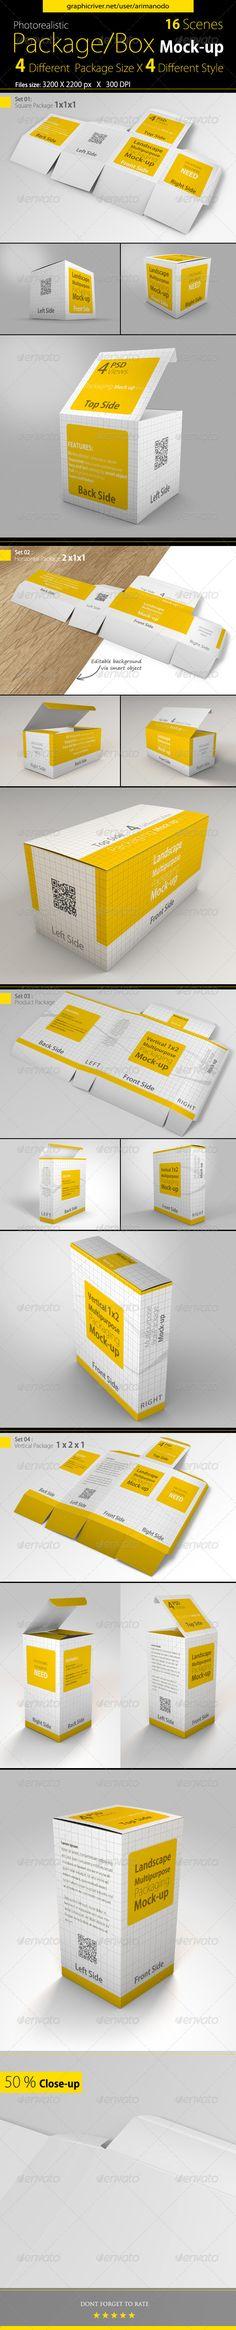 Multipurpose Package / Box Mock-ups - Product Mock-Ups Graphics